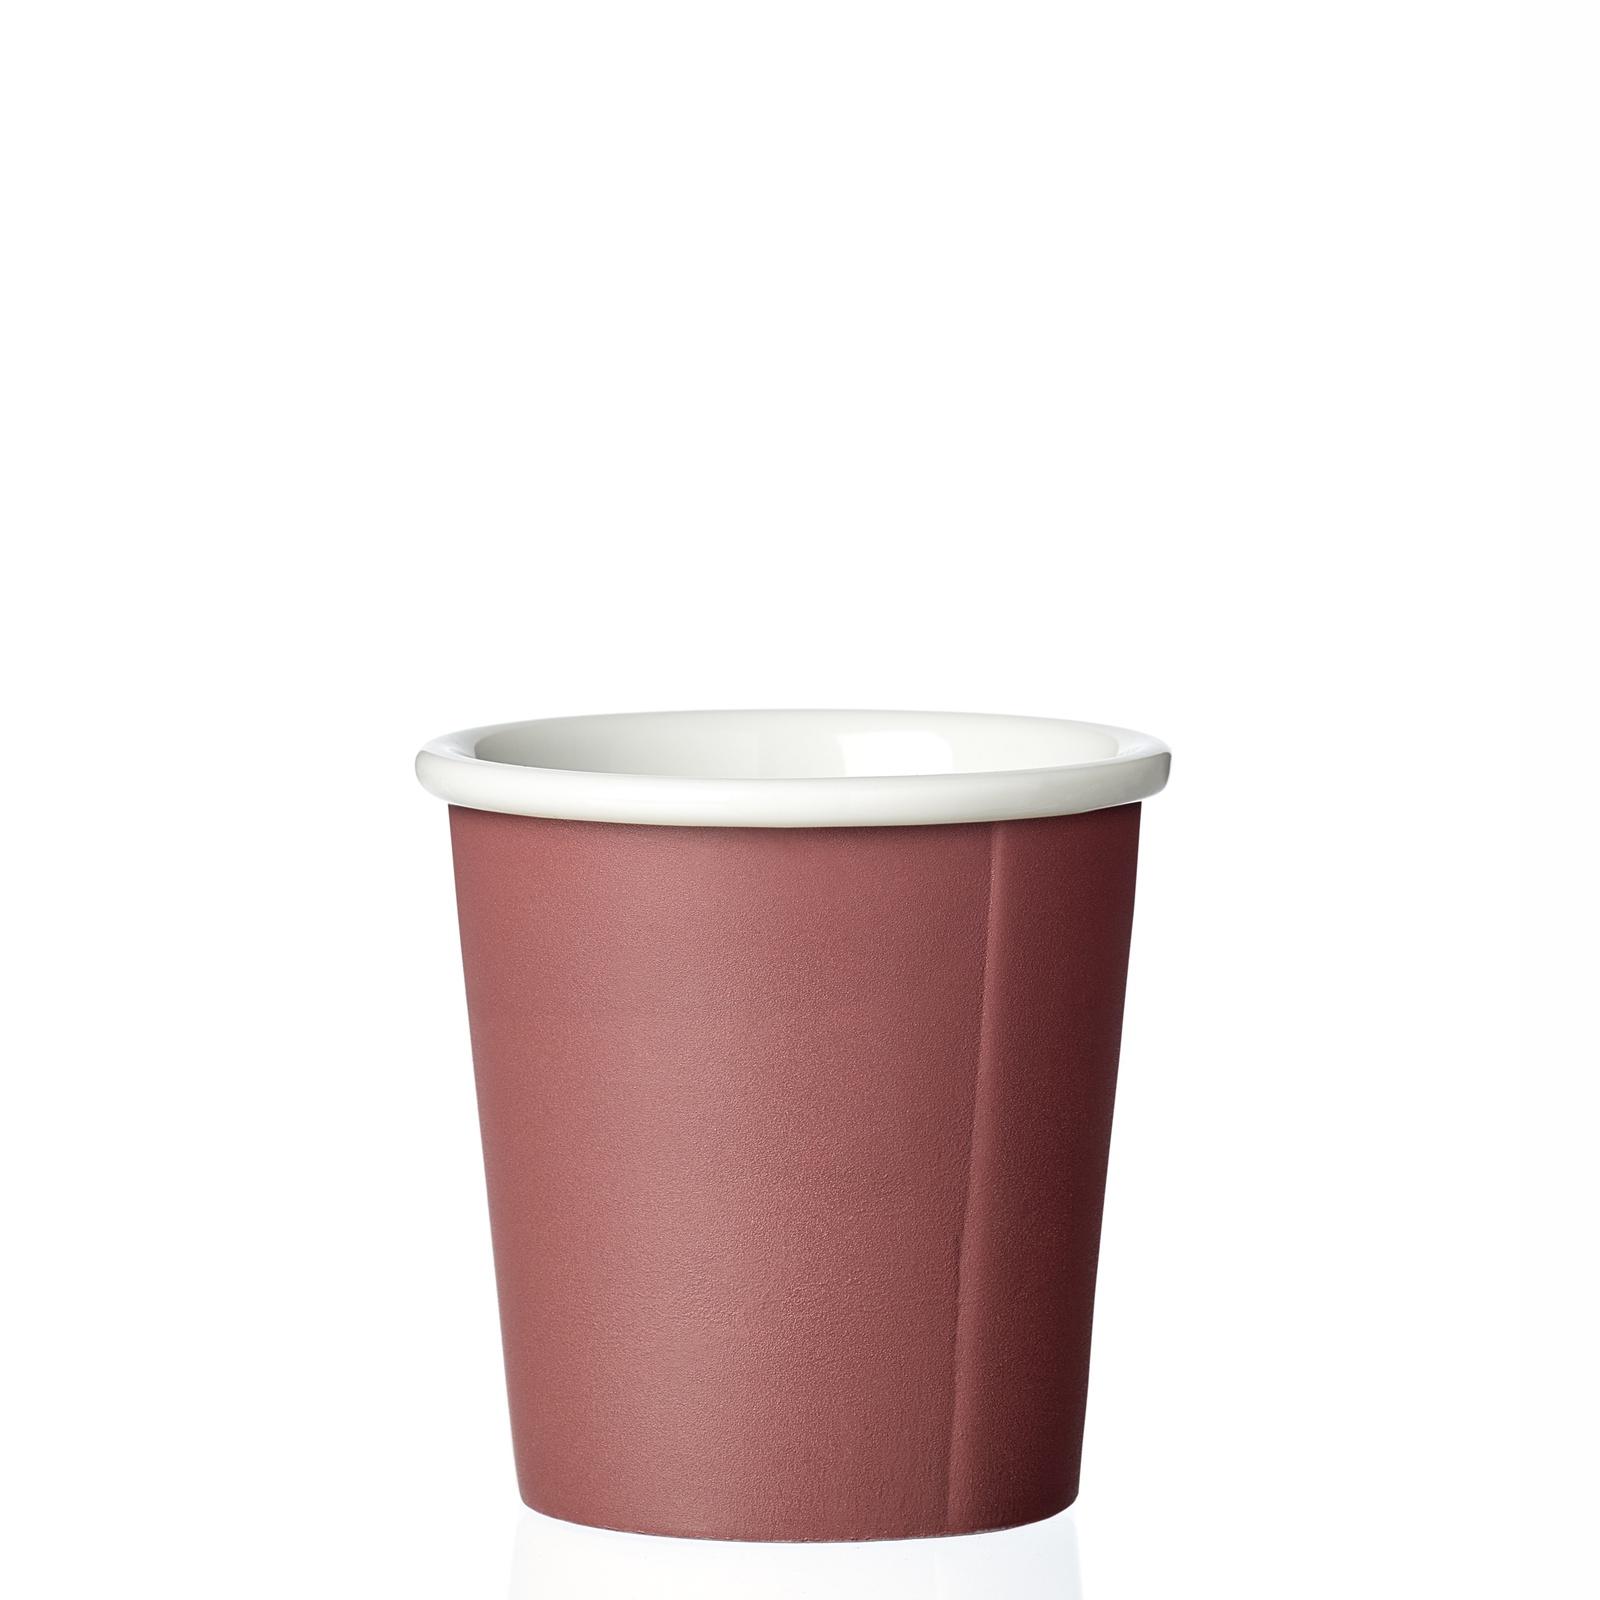 Чайный стакан Viva scandinavia Annа, V70153, бордовый, 0,08л